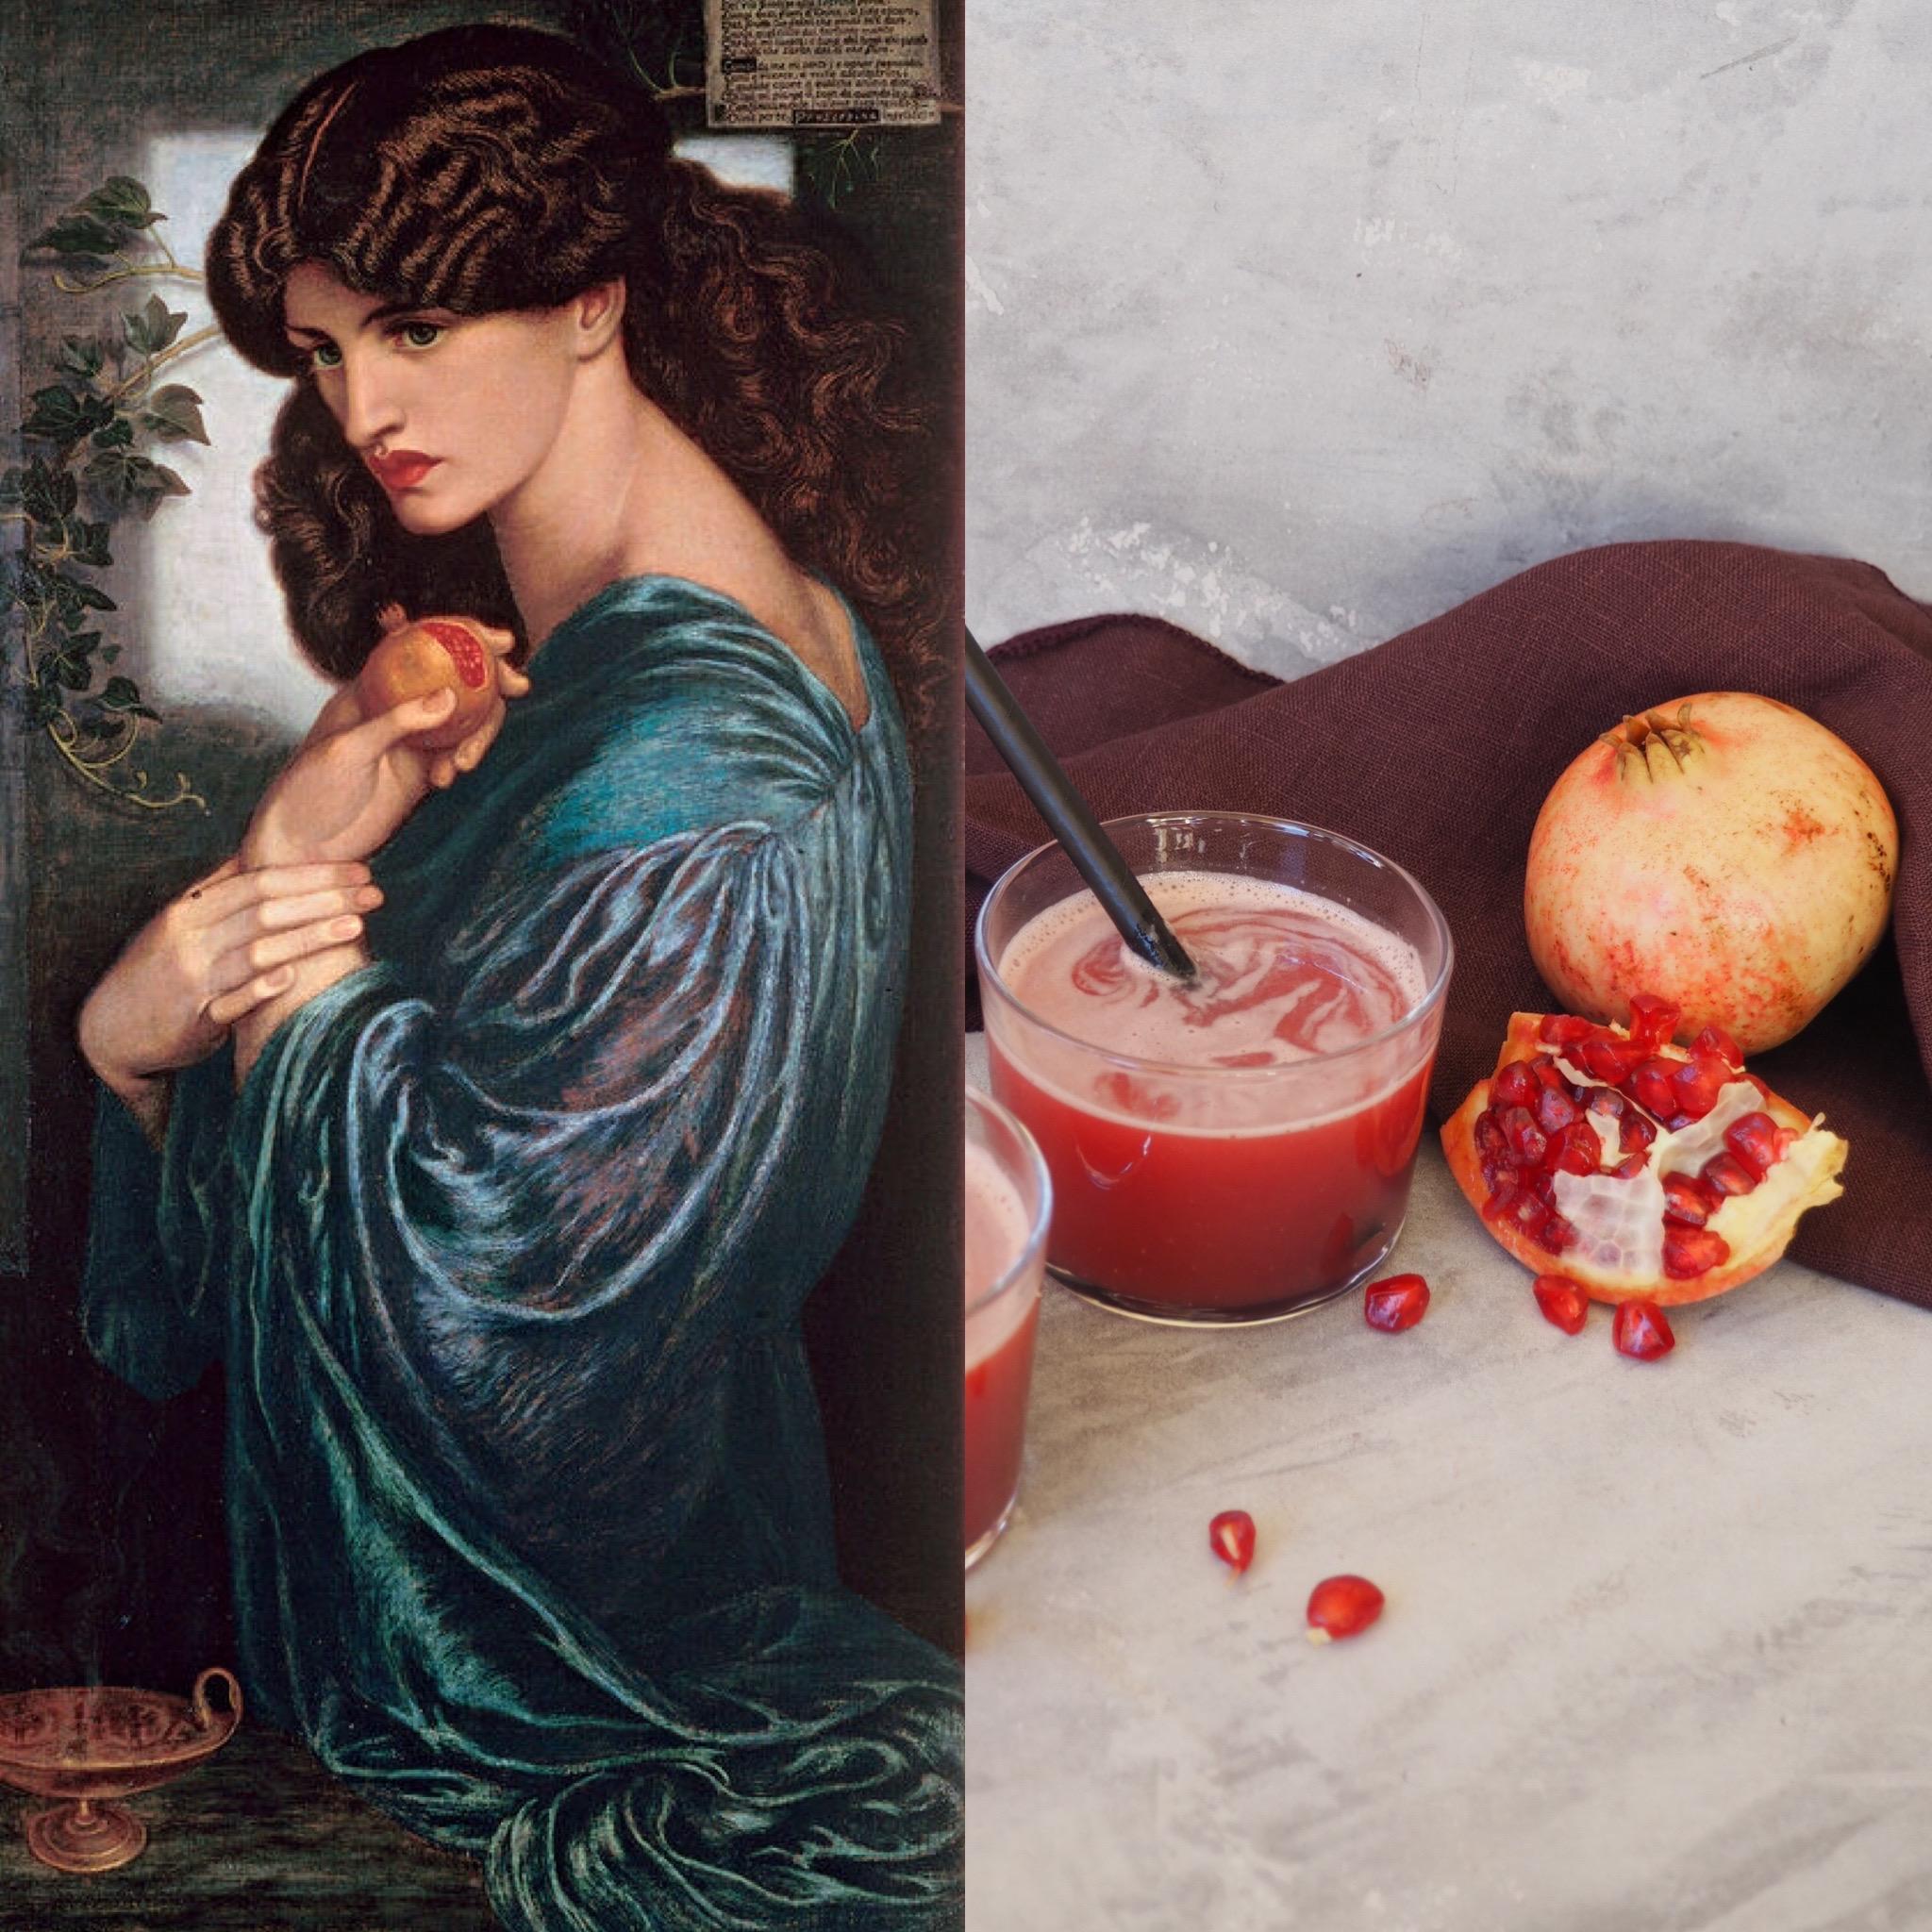 Dante Gabriel Rossetti, Proserpina i el suc de magrana (CAT)